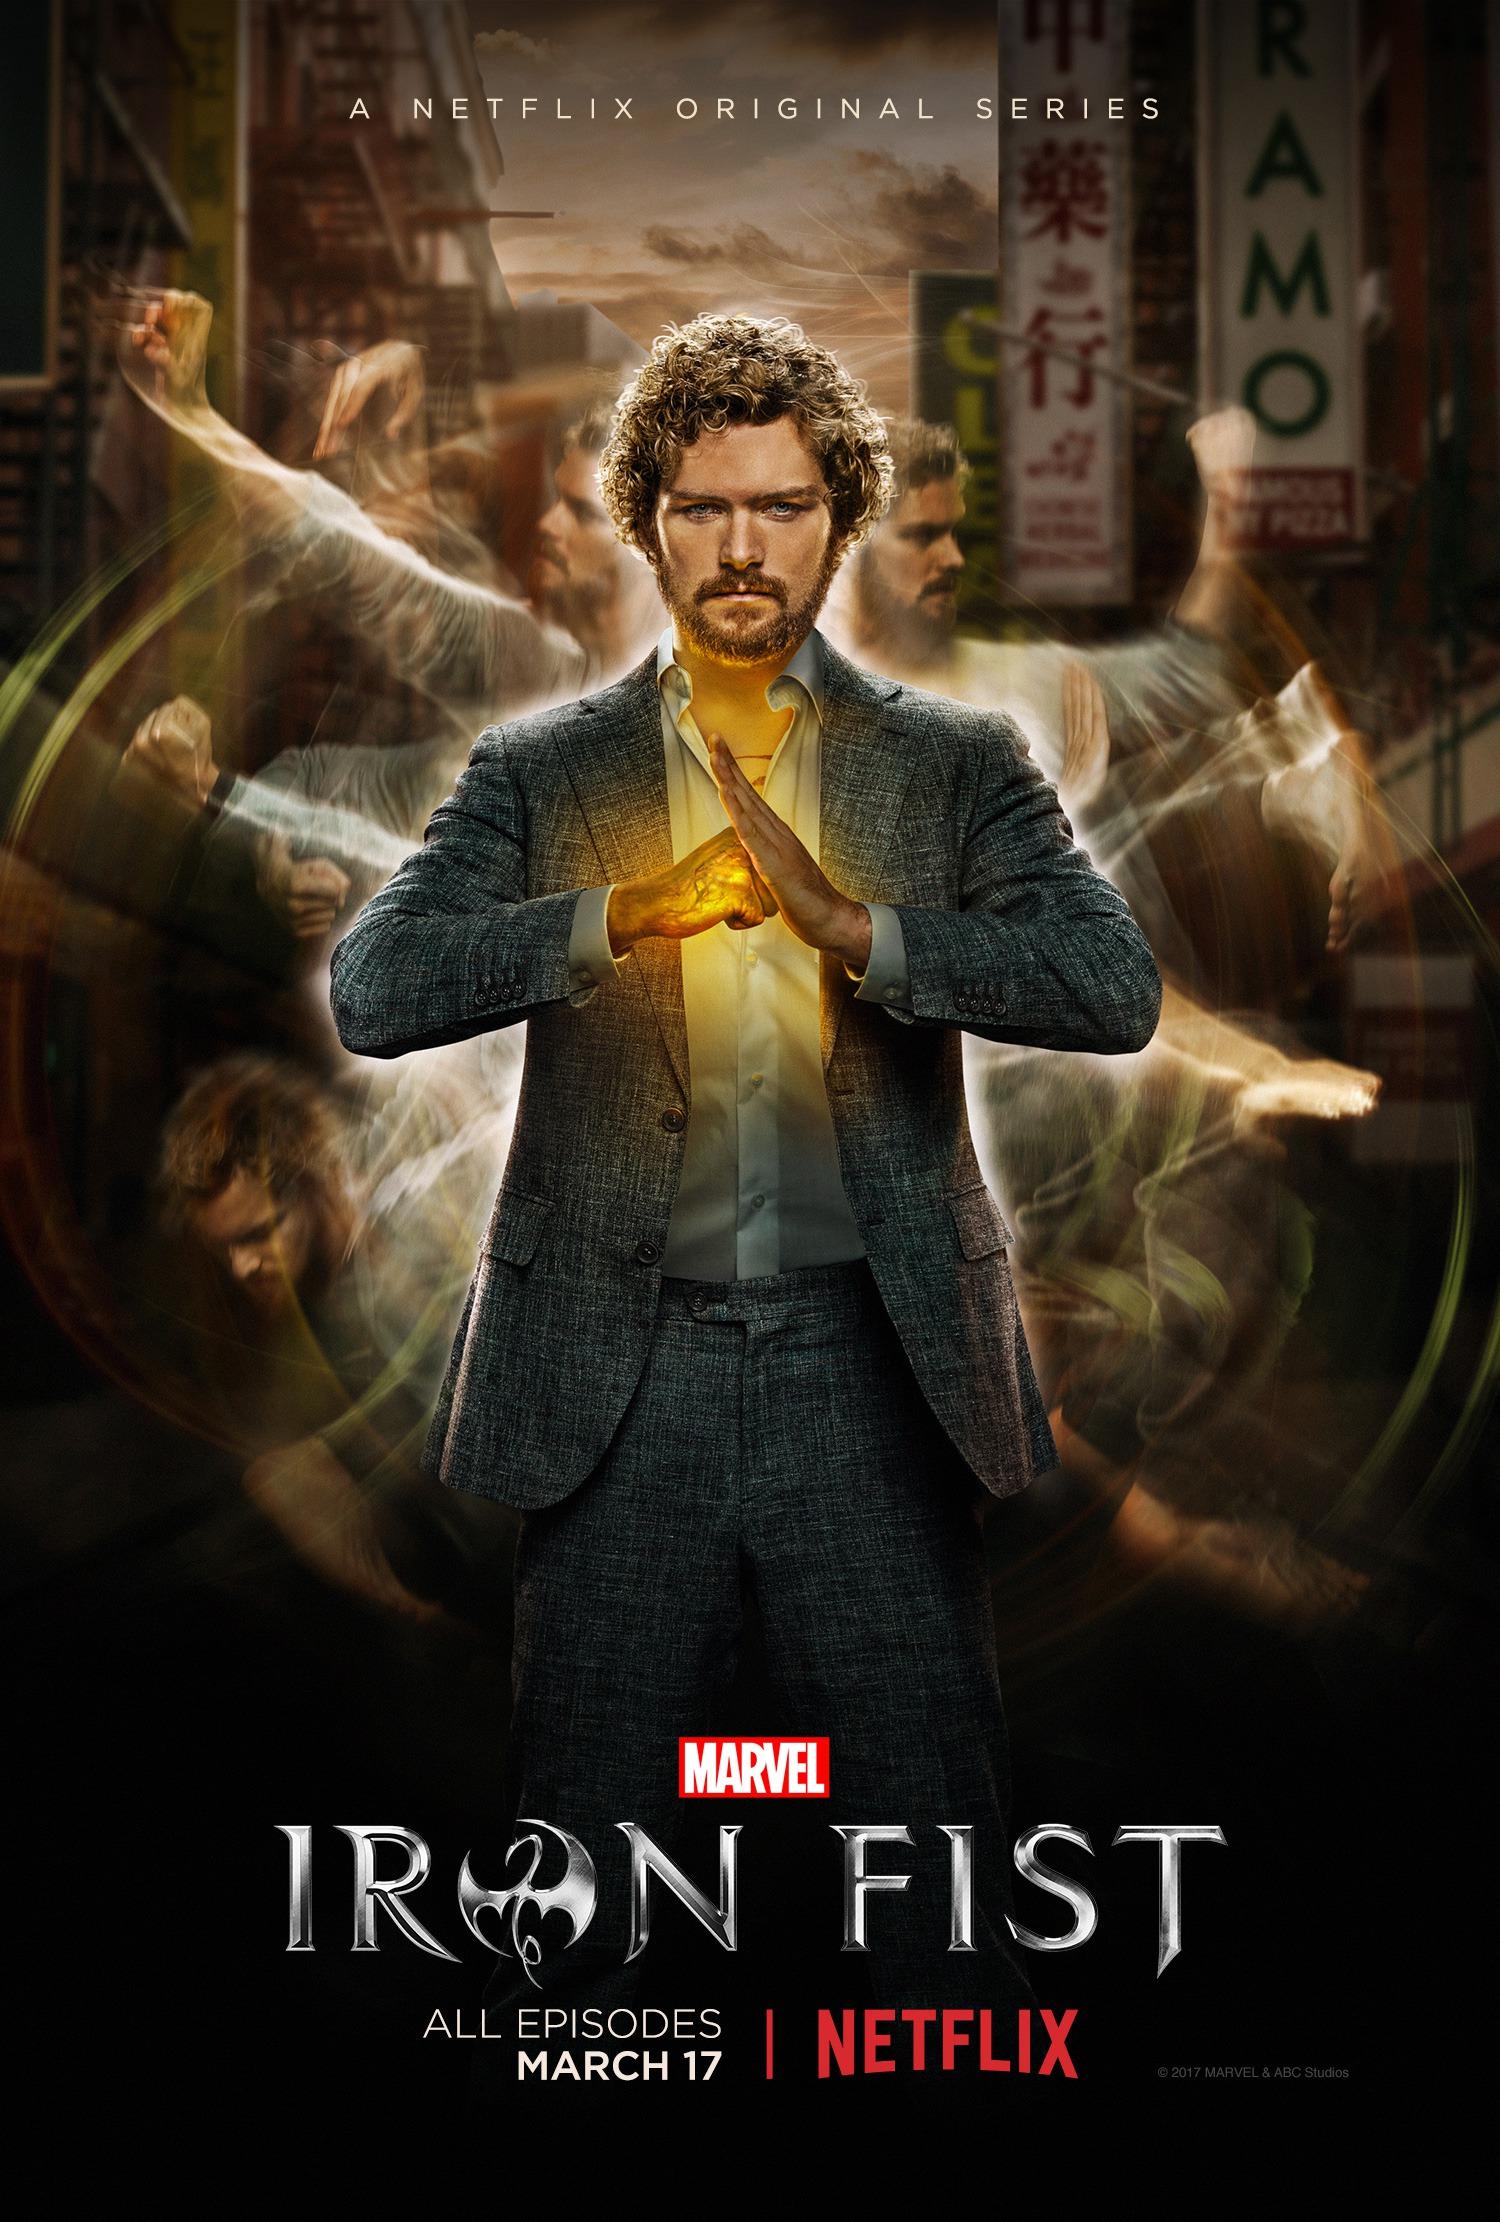 Iron Fist Character Poster 01.jpg